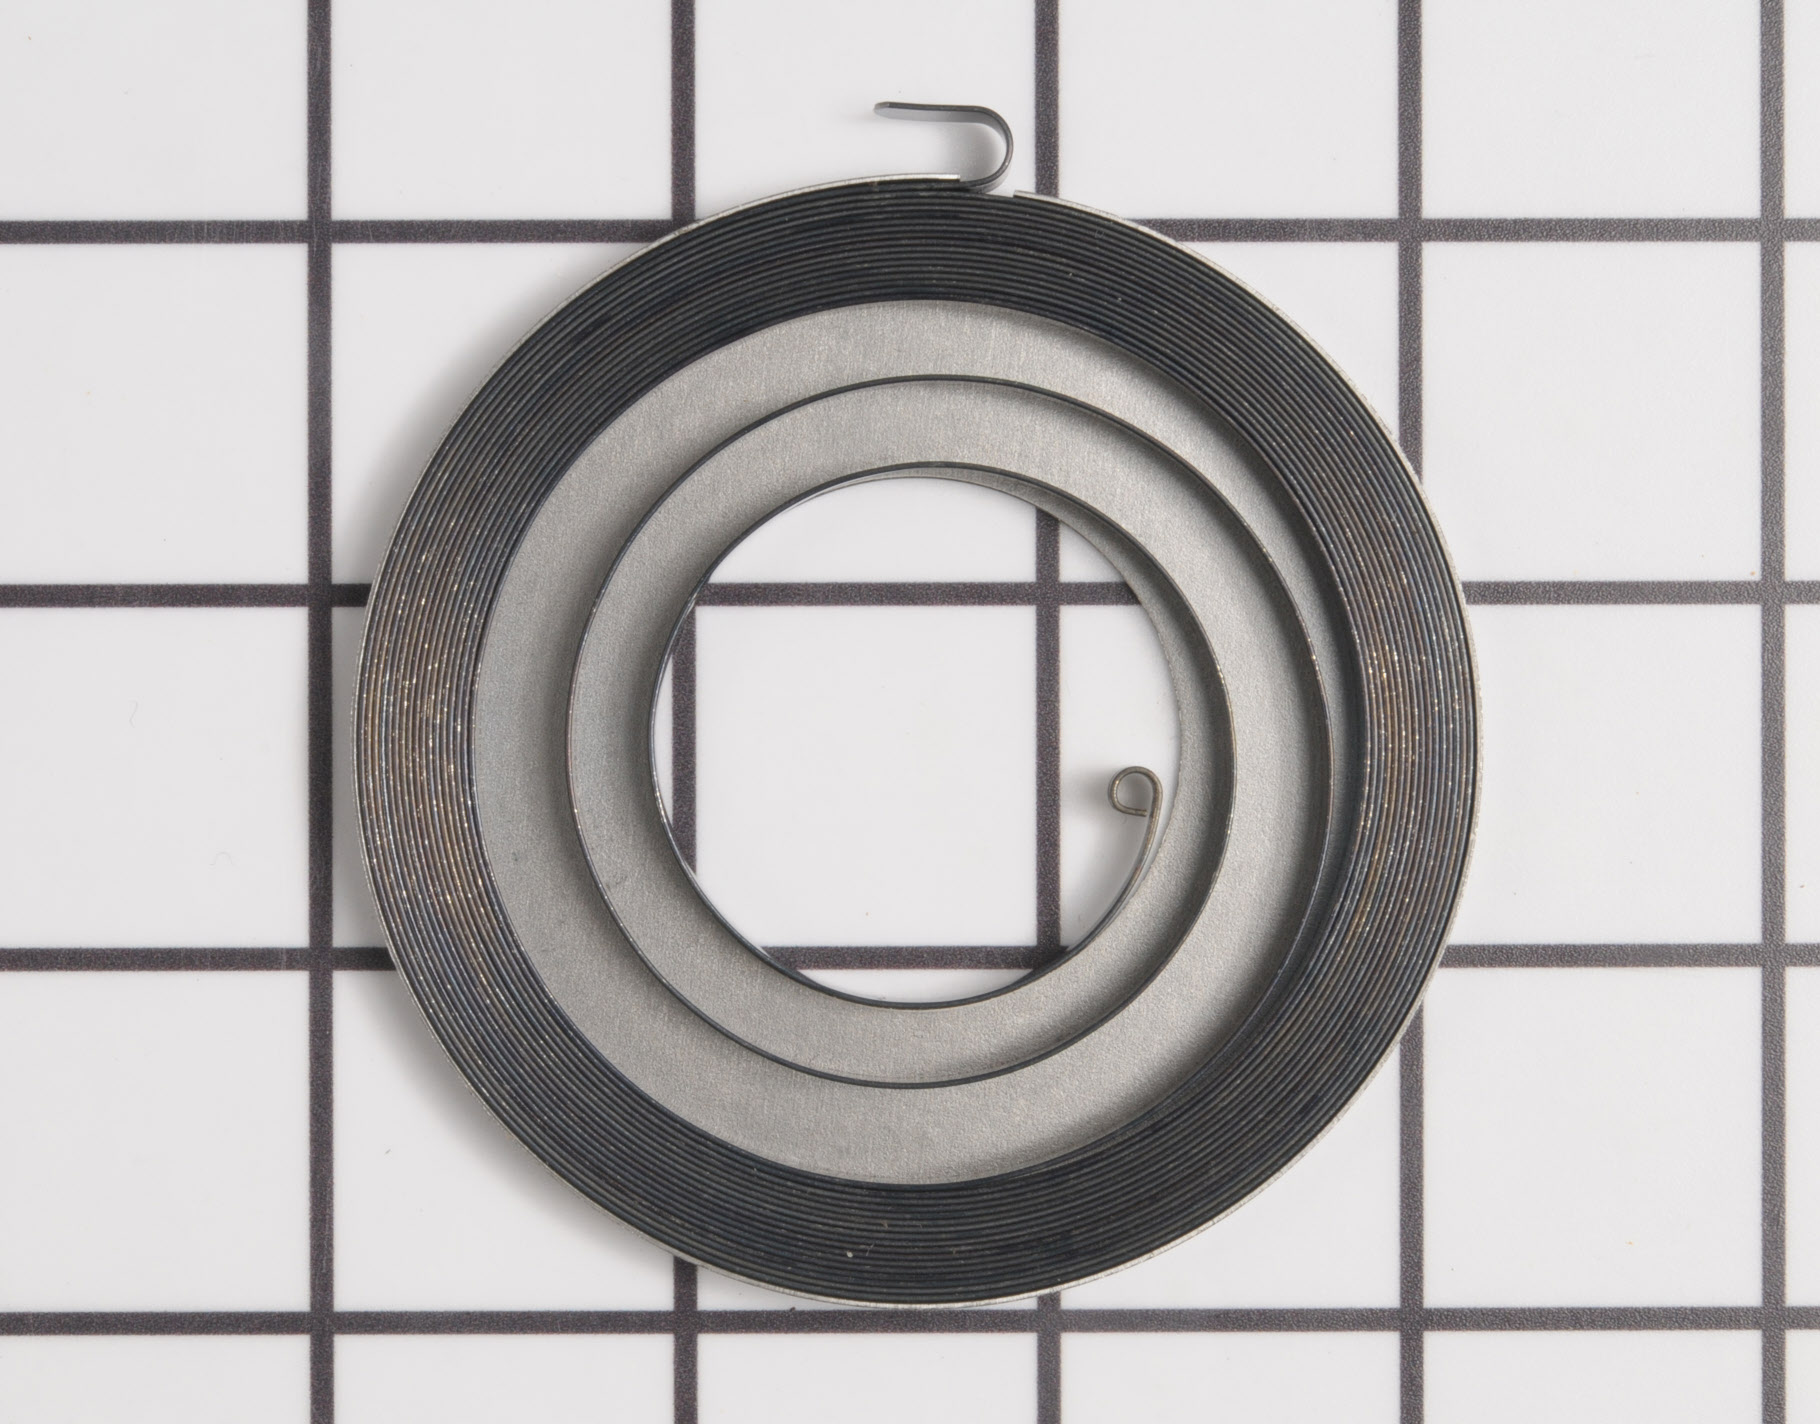 545008014 Poulan Pro Pole Pruner Part -Rewind Spring